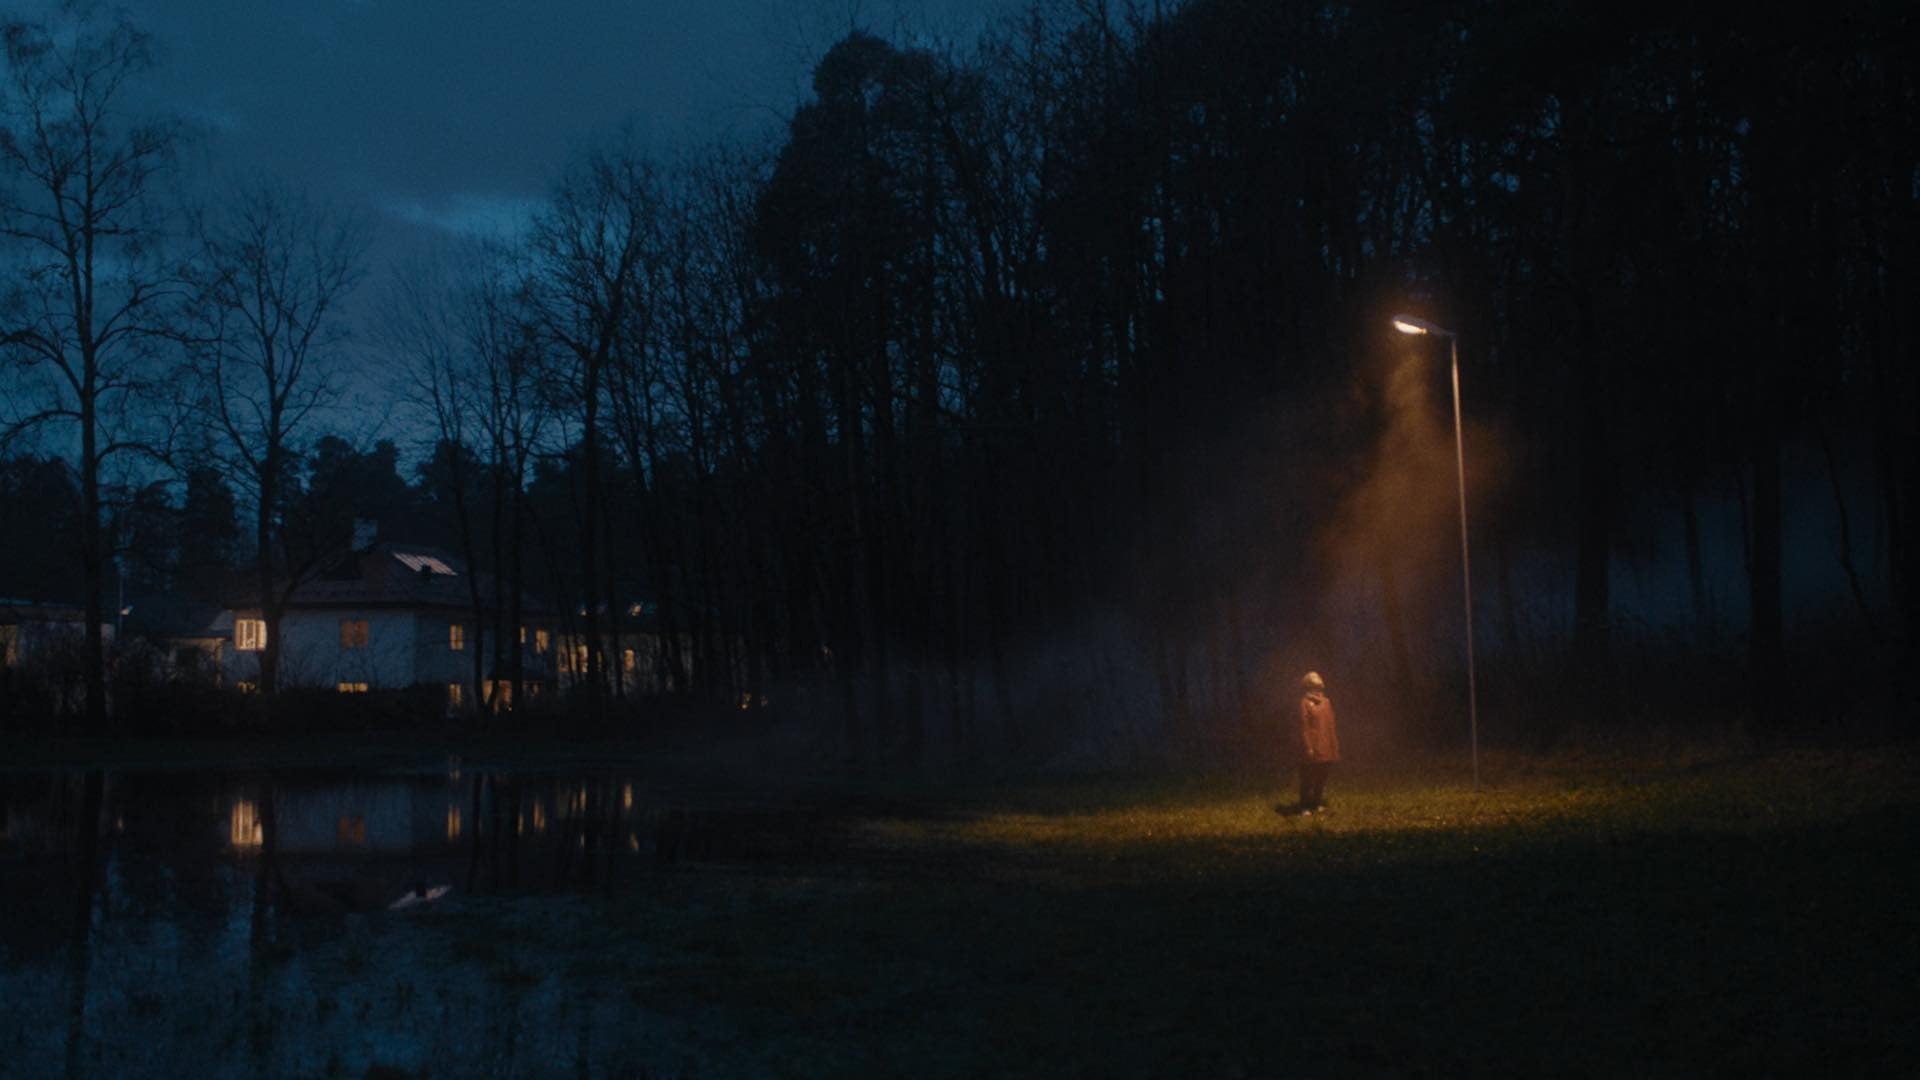 Street light, Water, Atmosphere, Plant, Sky, Window, Tree, Cloud